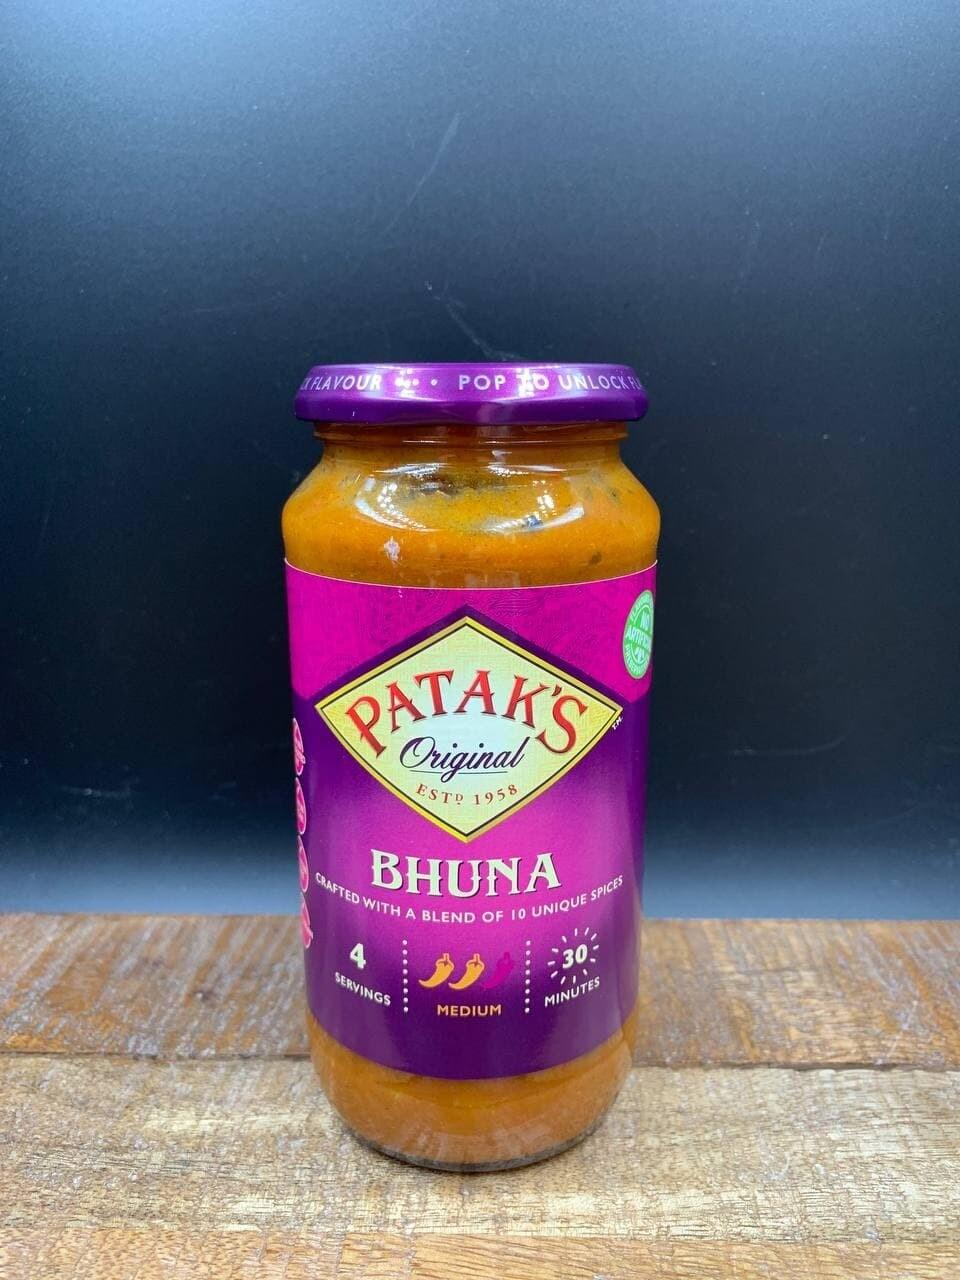 Patak's Original Bhuna 450g